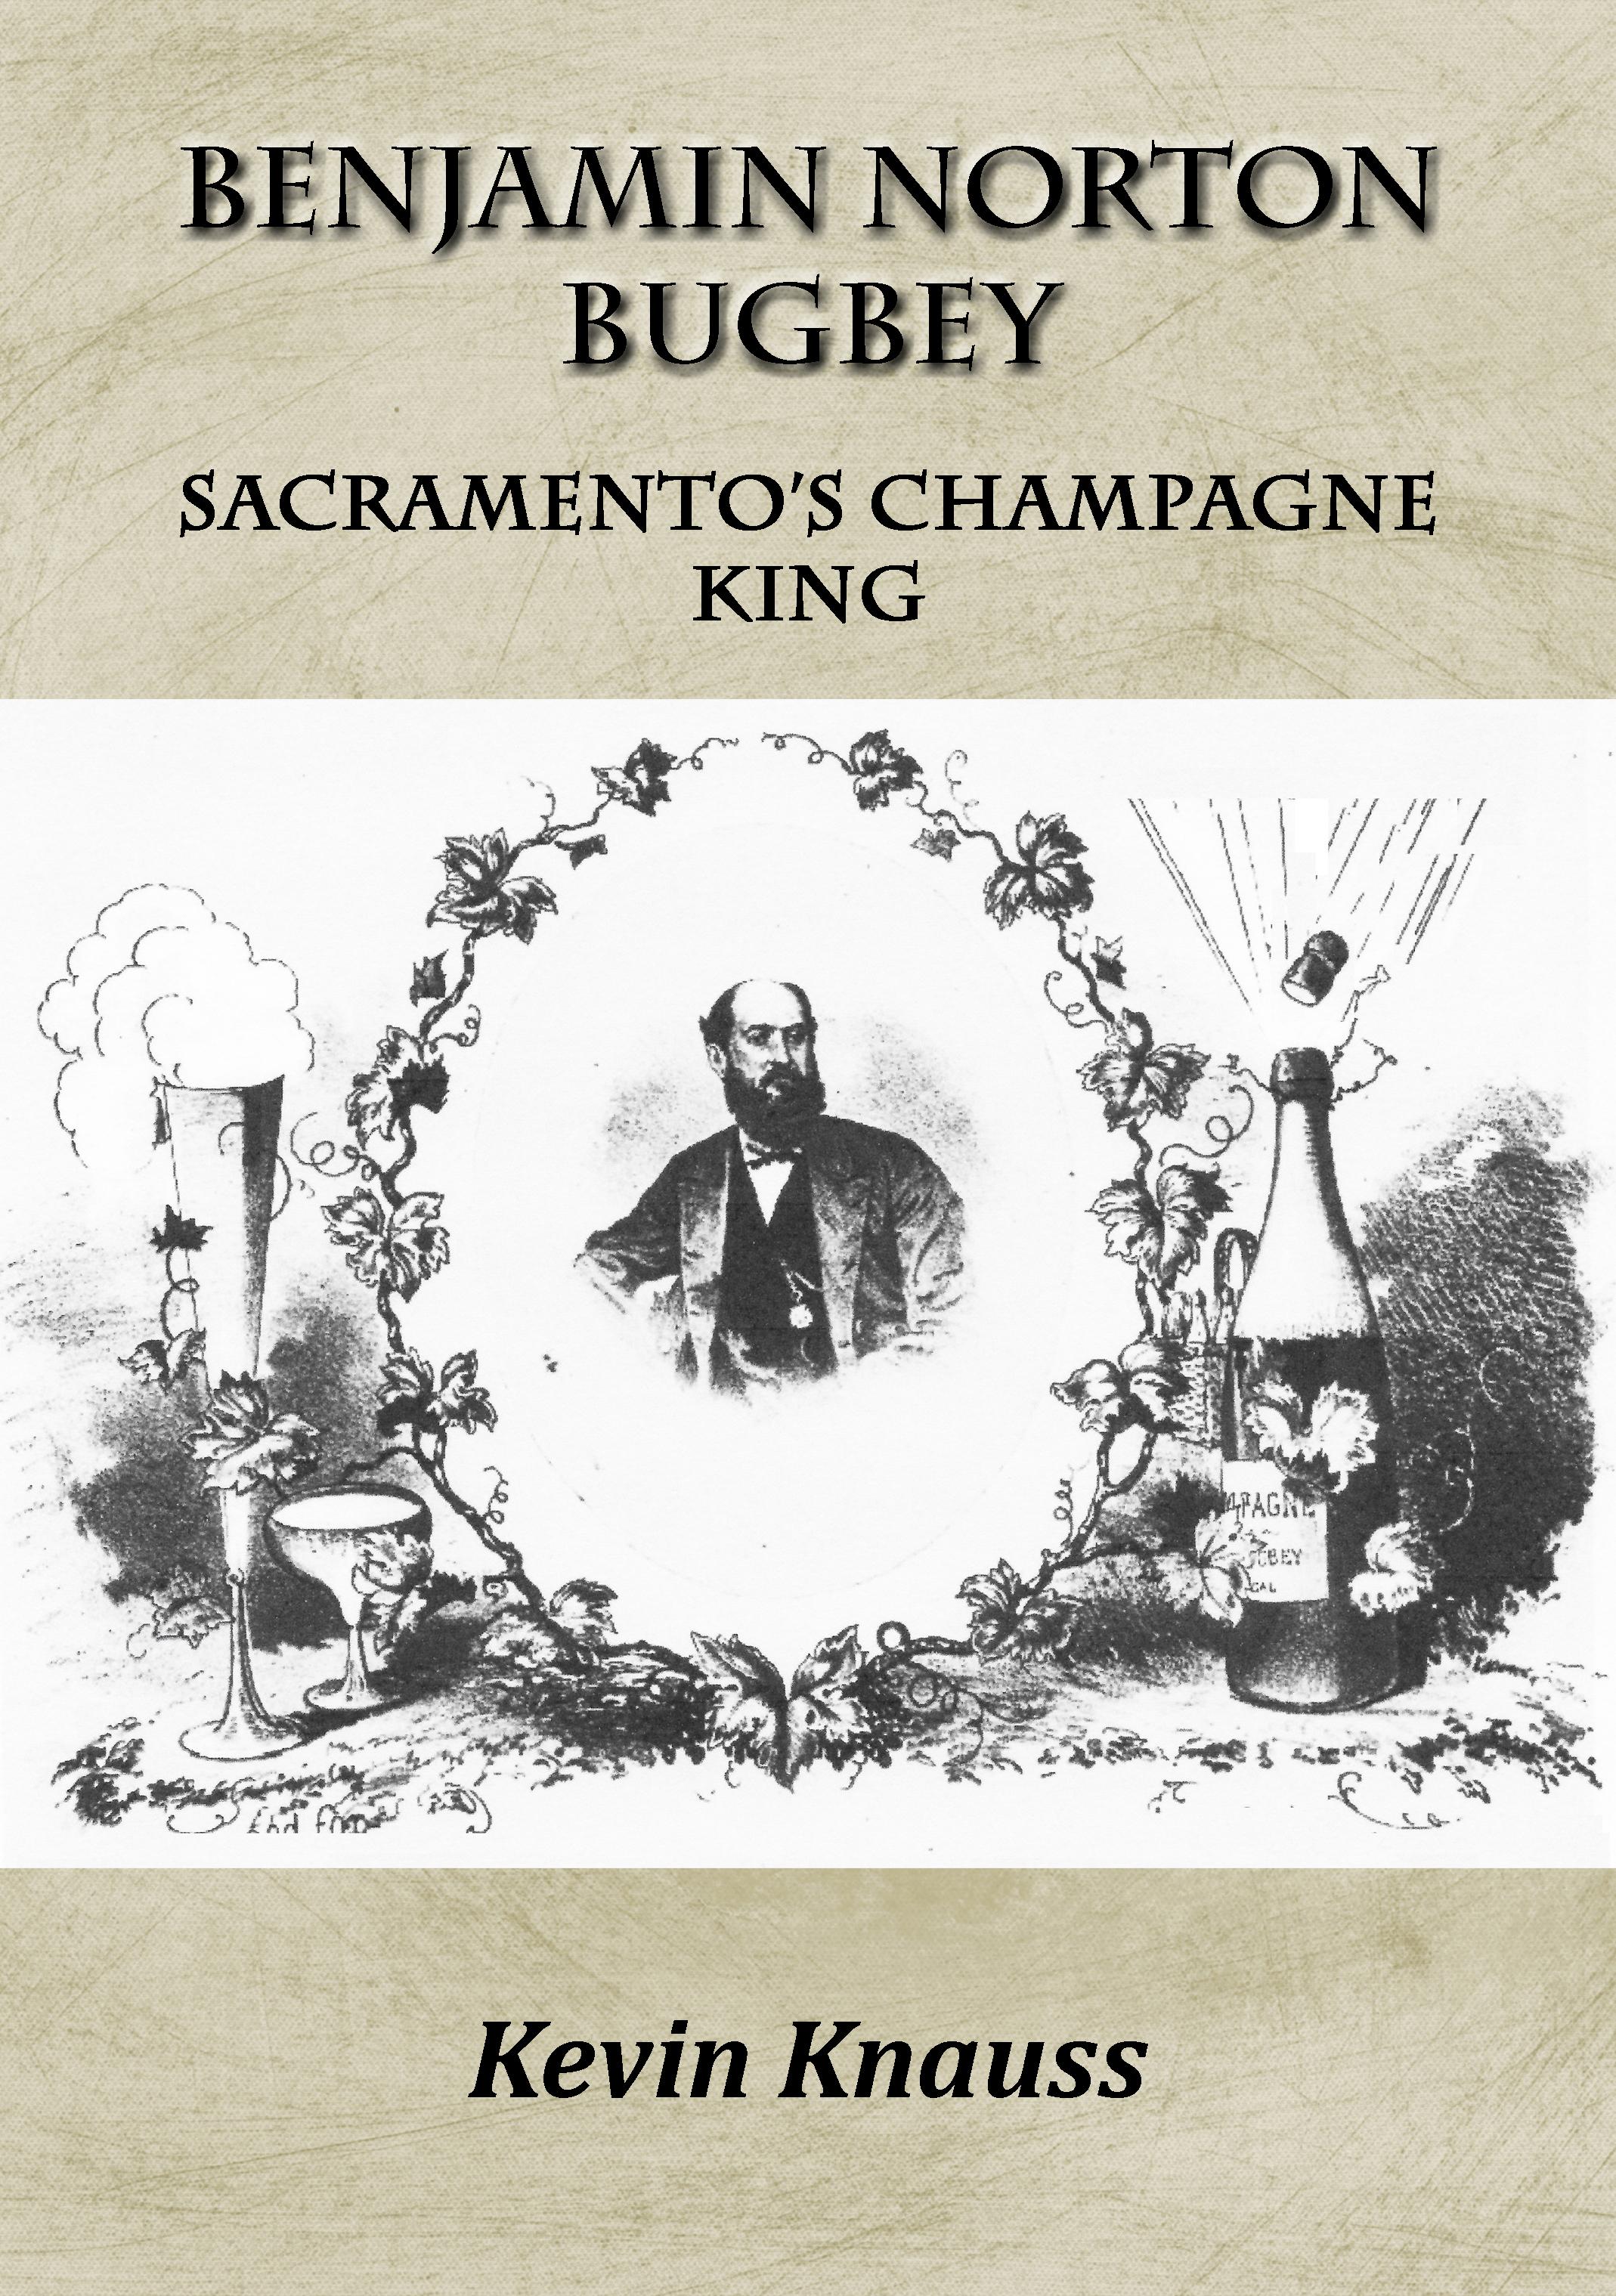 Benjamin Norton Bugbey, Sacramento's Champagne King